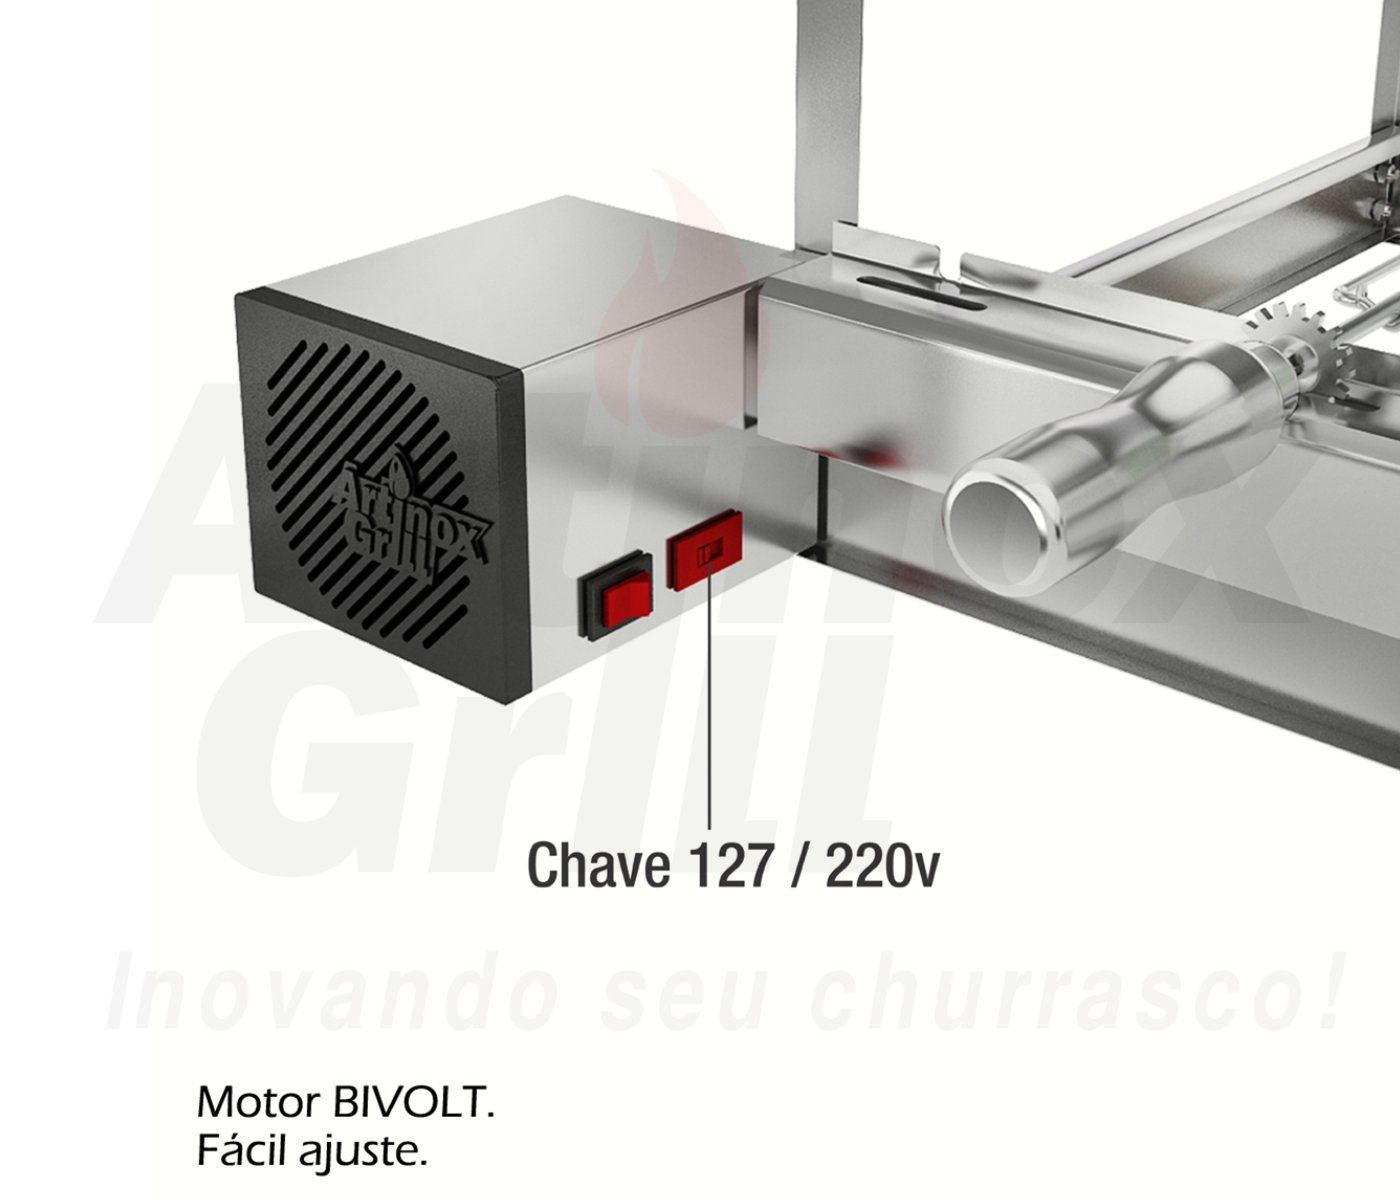 Churrasqueira Gira Grill Inox 11 Espetos Giratórios - 2 Andares e 2 Motores Bivolt